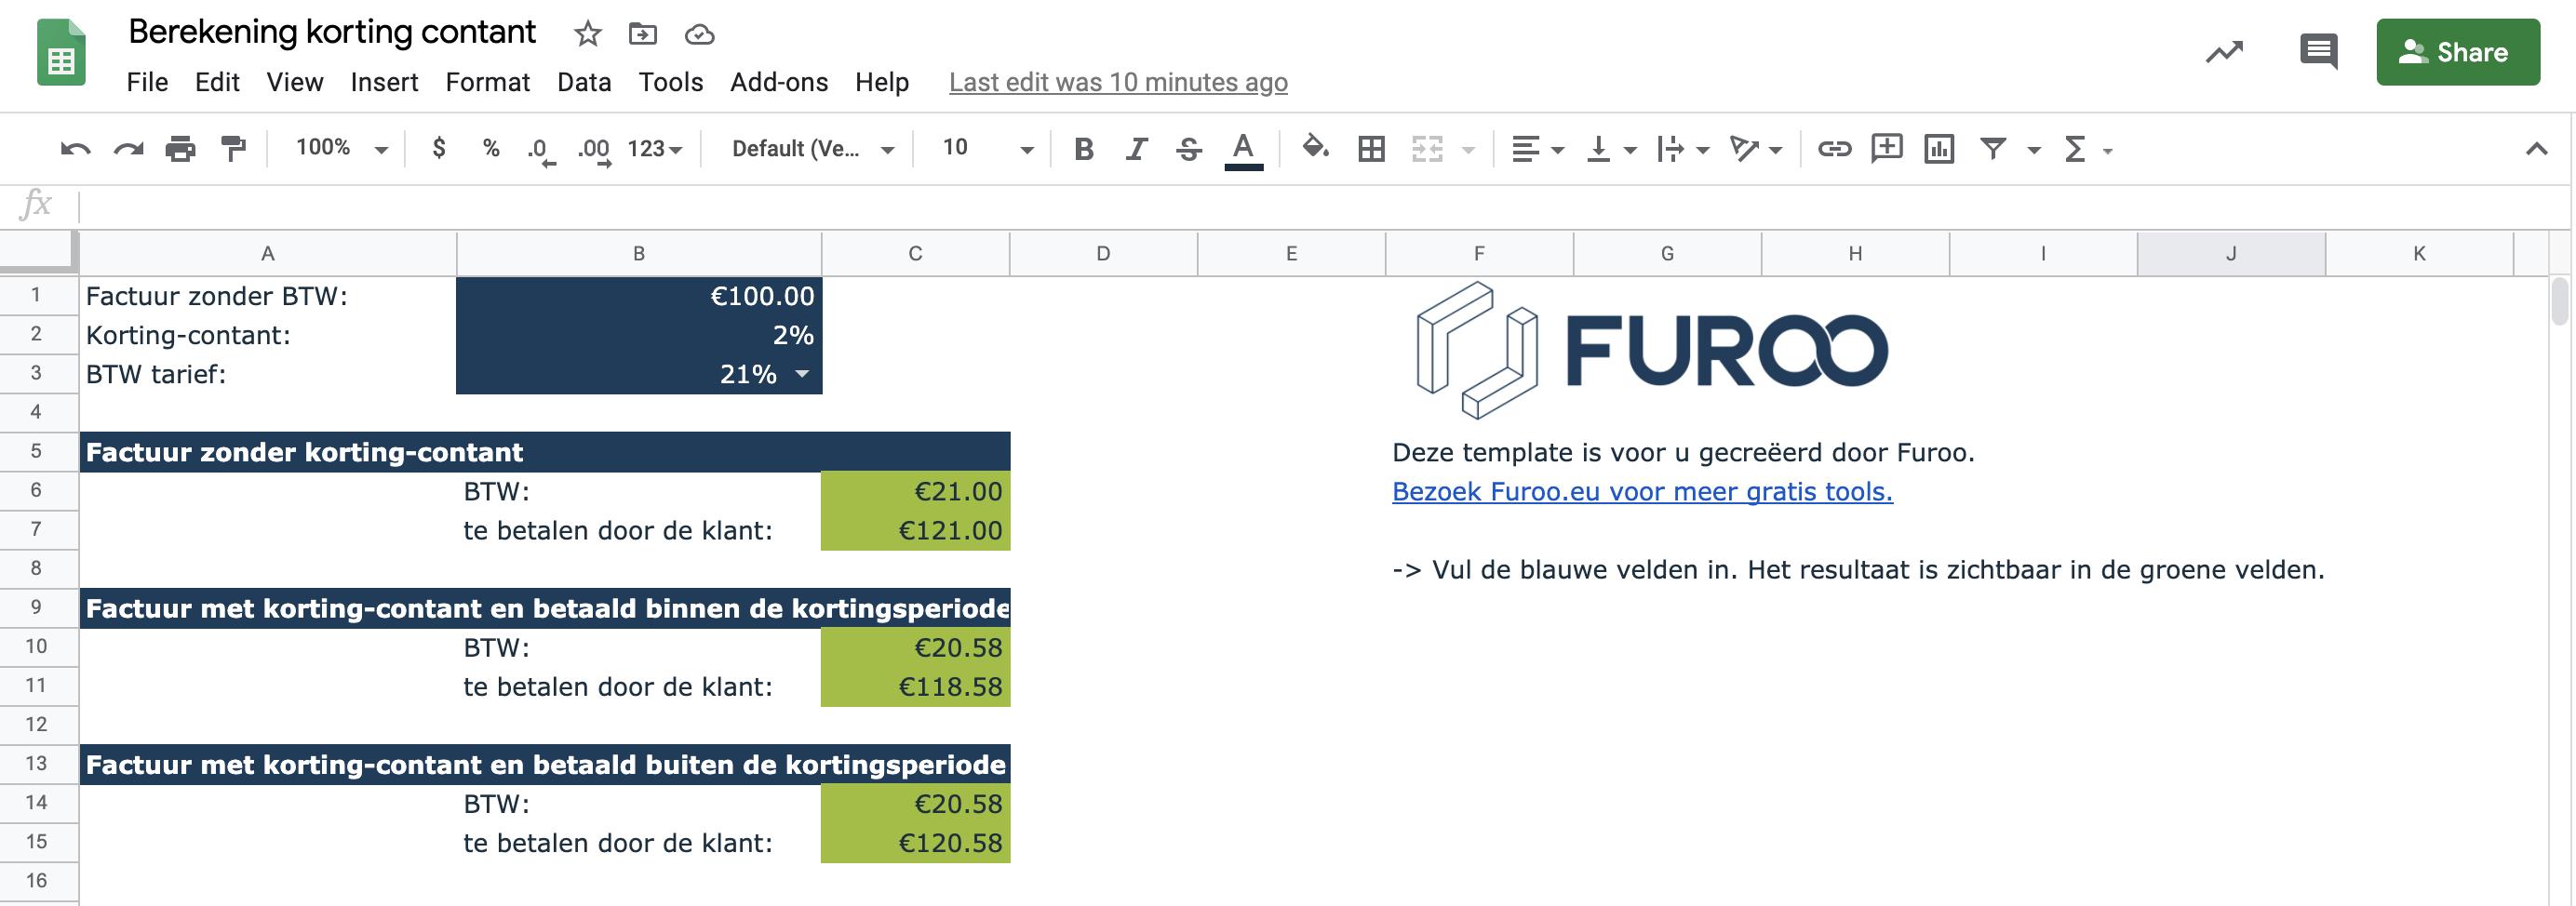 Korting contant tool Furoo